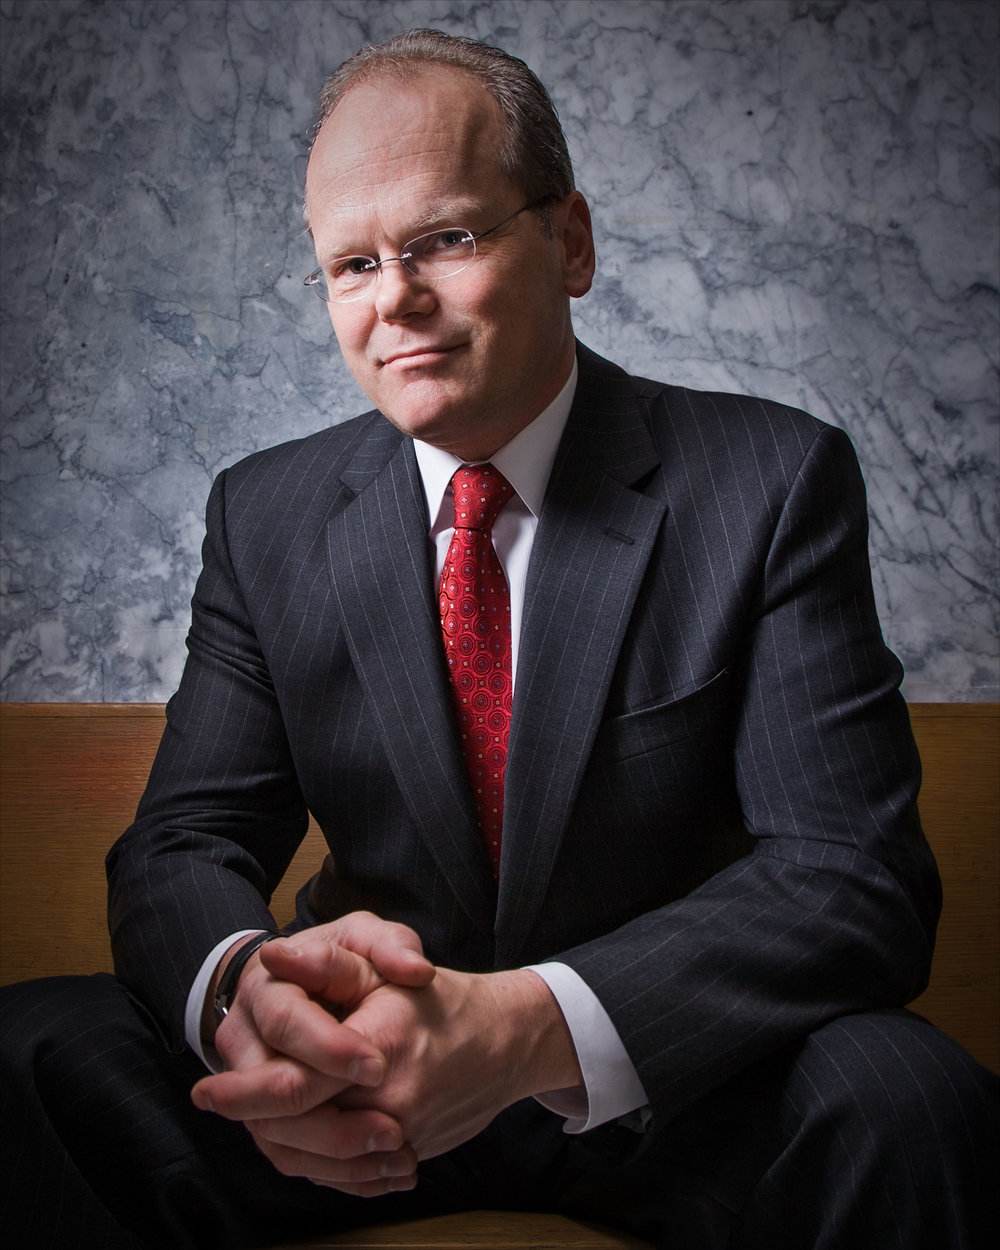 Dan Satterberg, King County Prosecuting Attorney